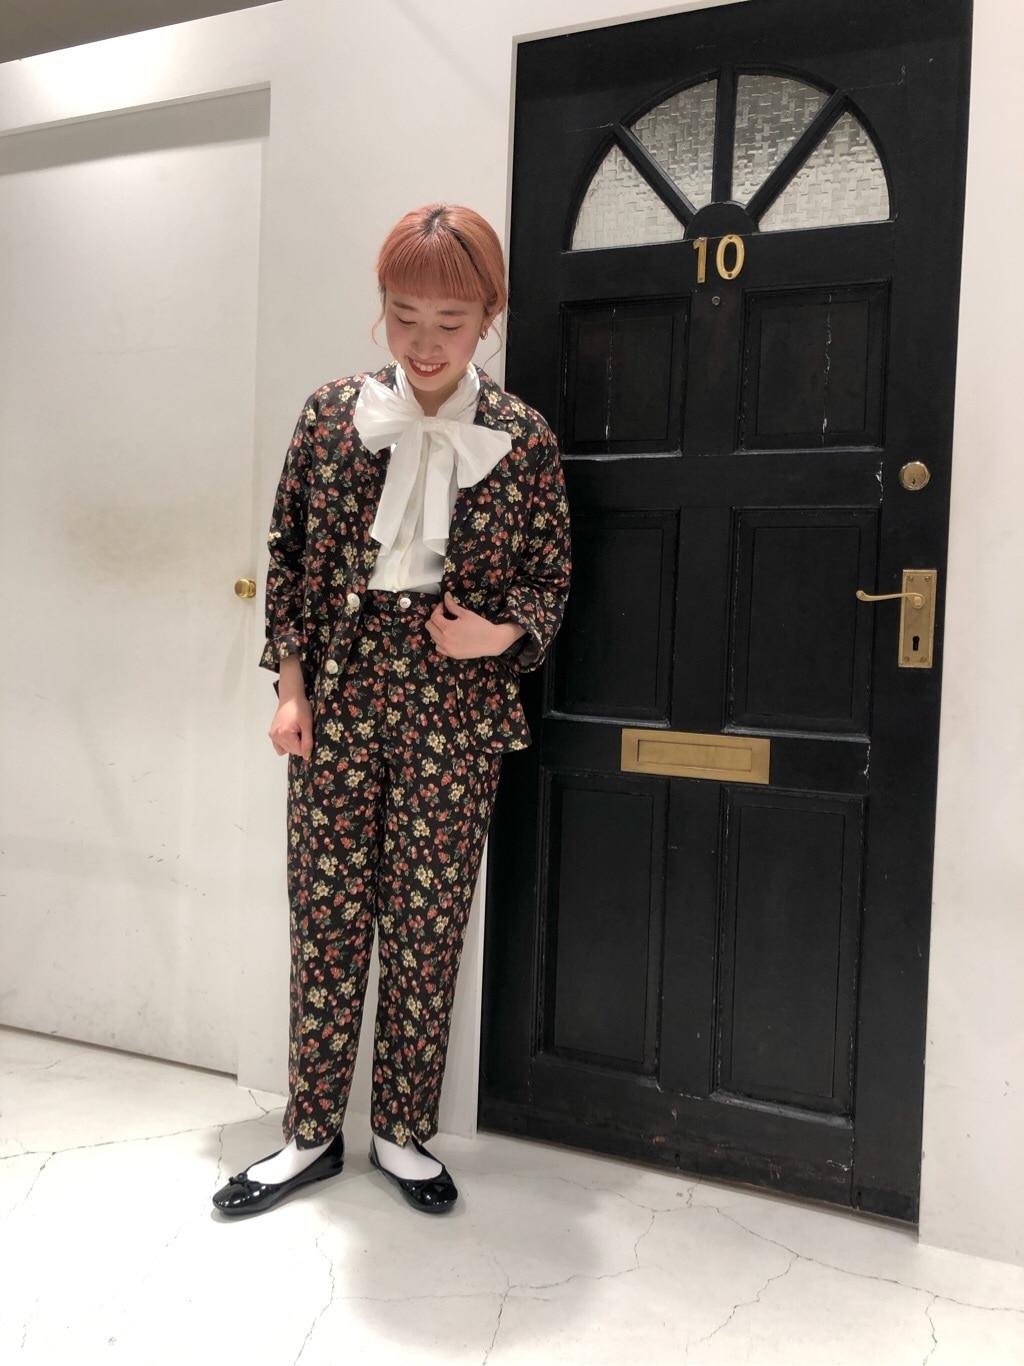 Dot and Stripes CHILD WOMAN ルクアイーレ 身長:157cm 2020.04.17